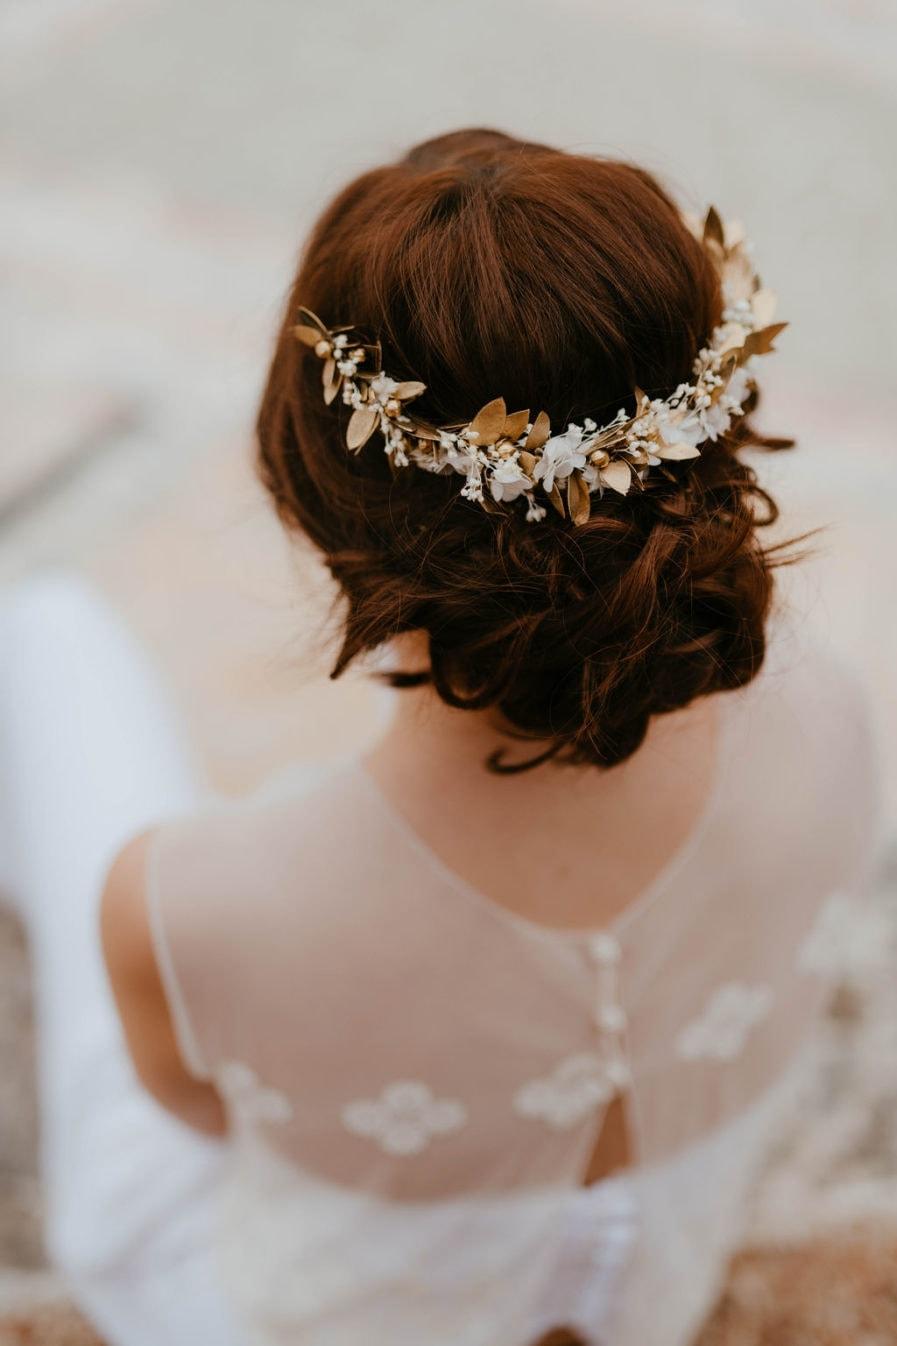 Peigne de mariée Ori long - Anaïs Nannini Photographe - Les Fleurs Dupont